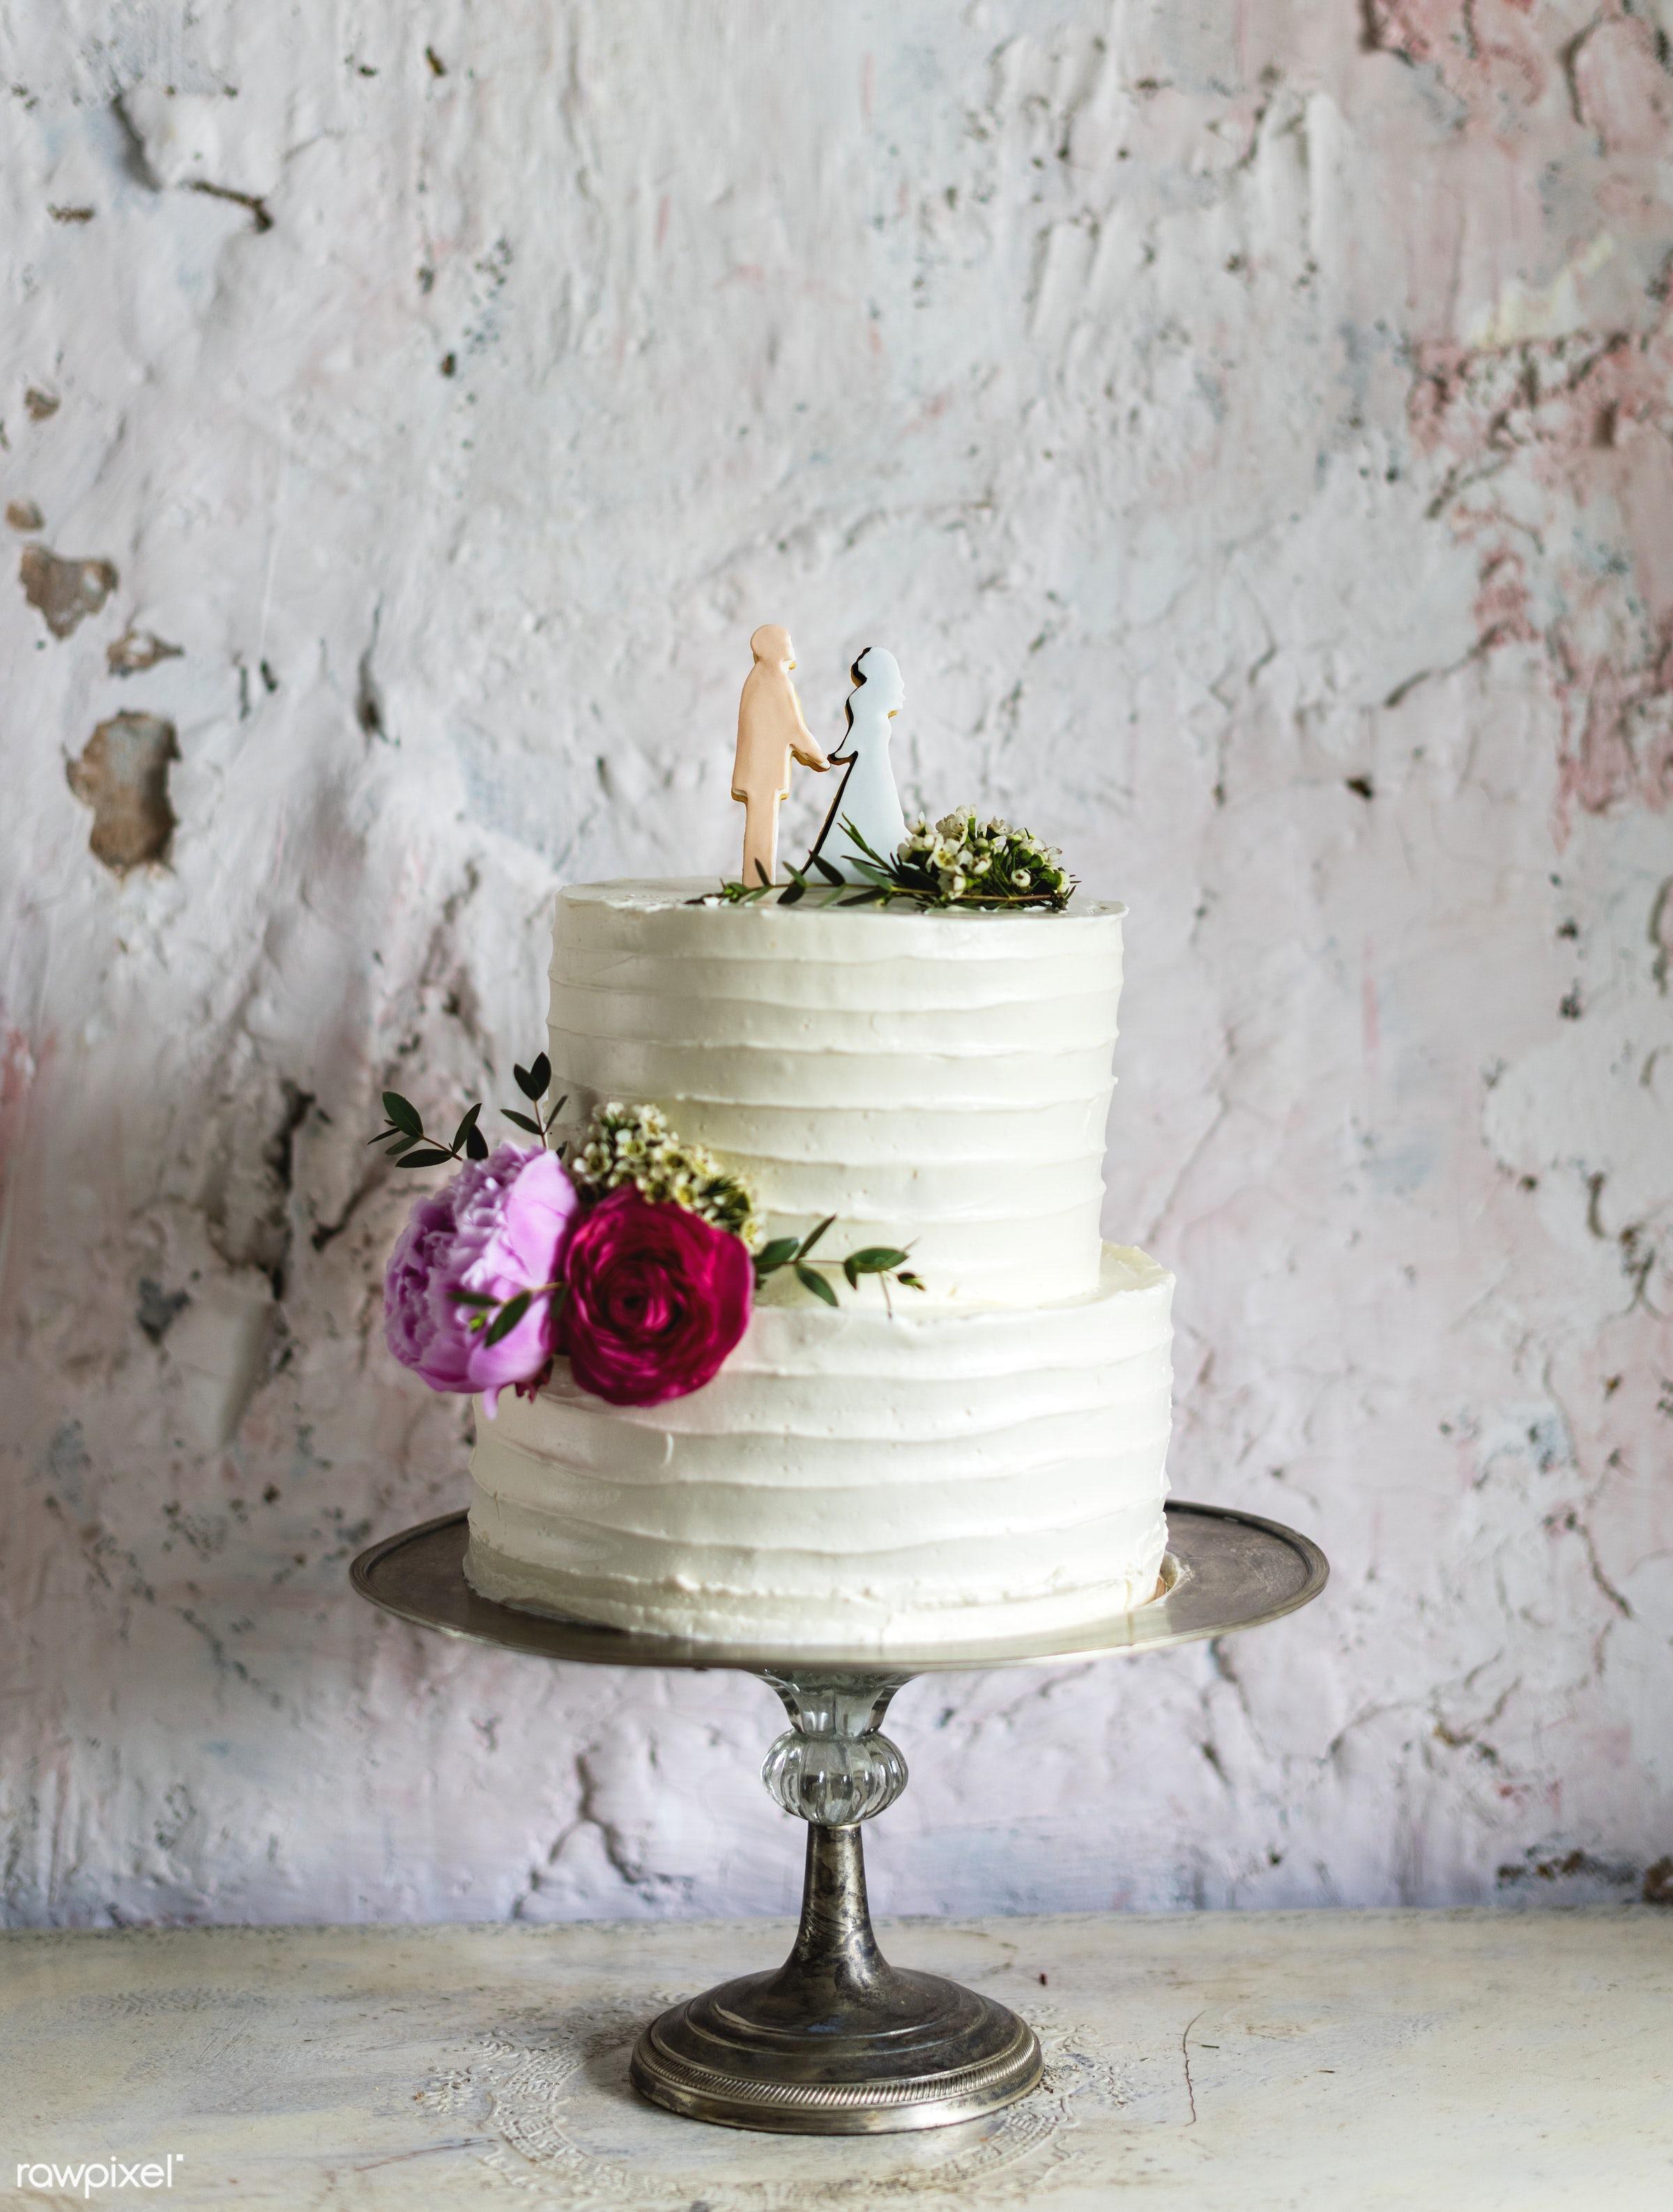 nobody, waxflowers, couple topper, figure, bakery, event, banquet, bride, flowers, dessert, cake, decoration, white,...